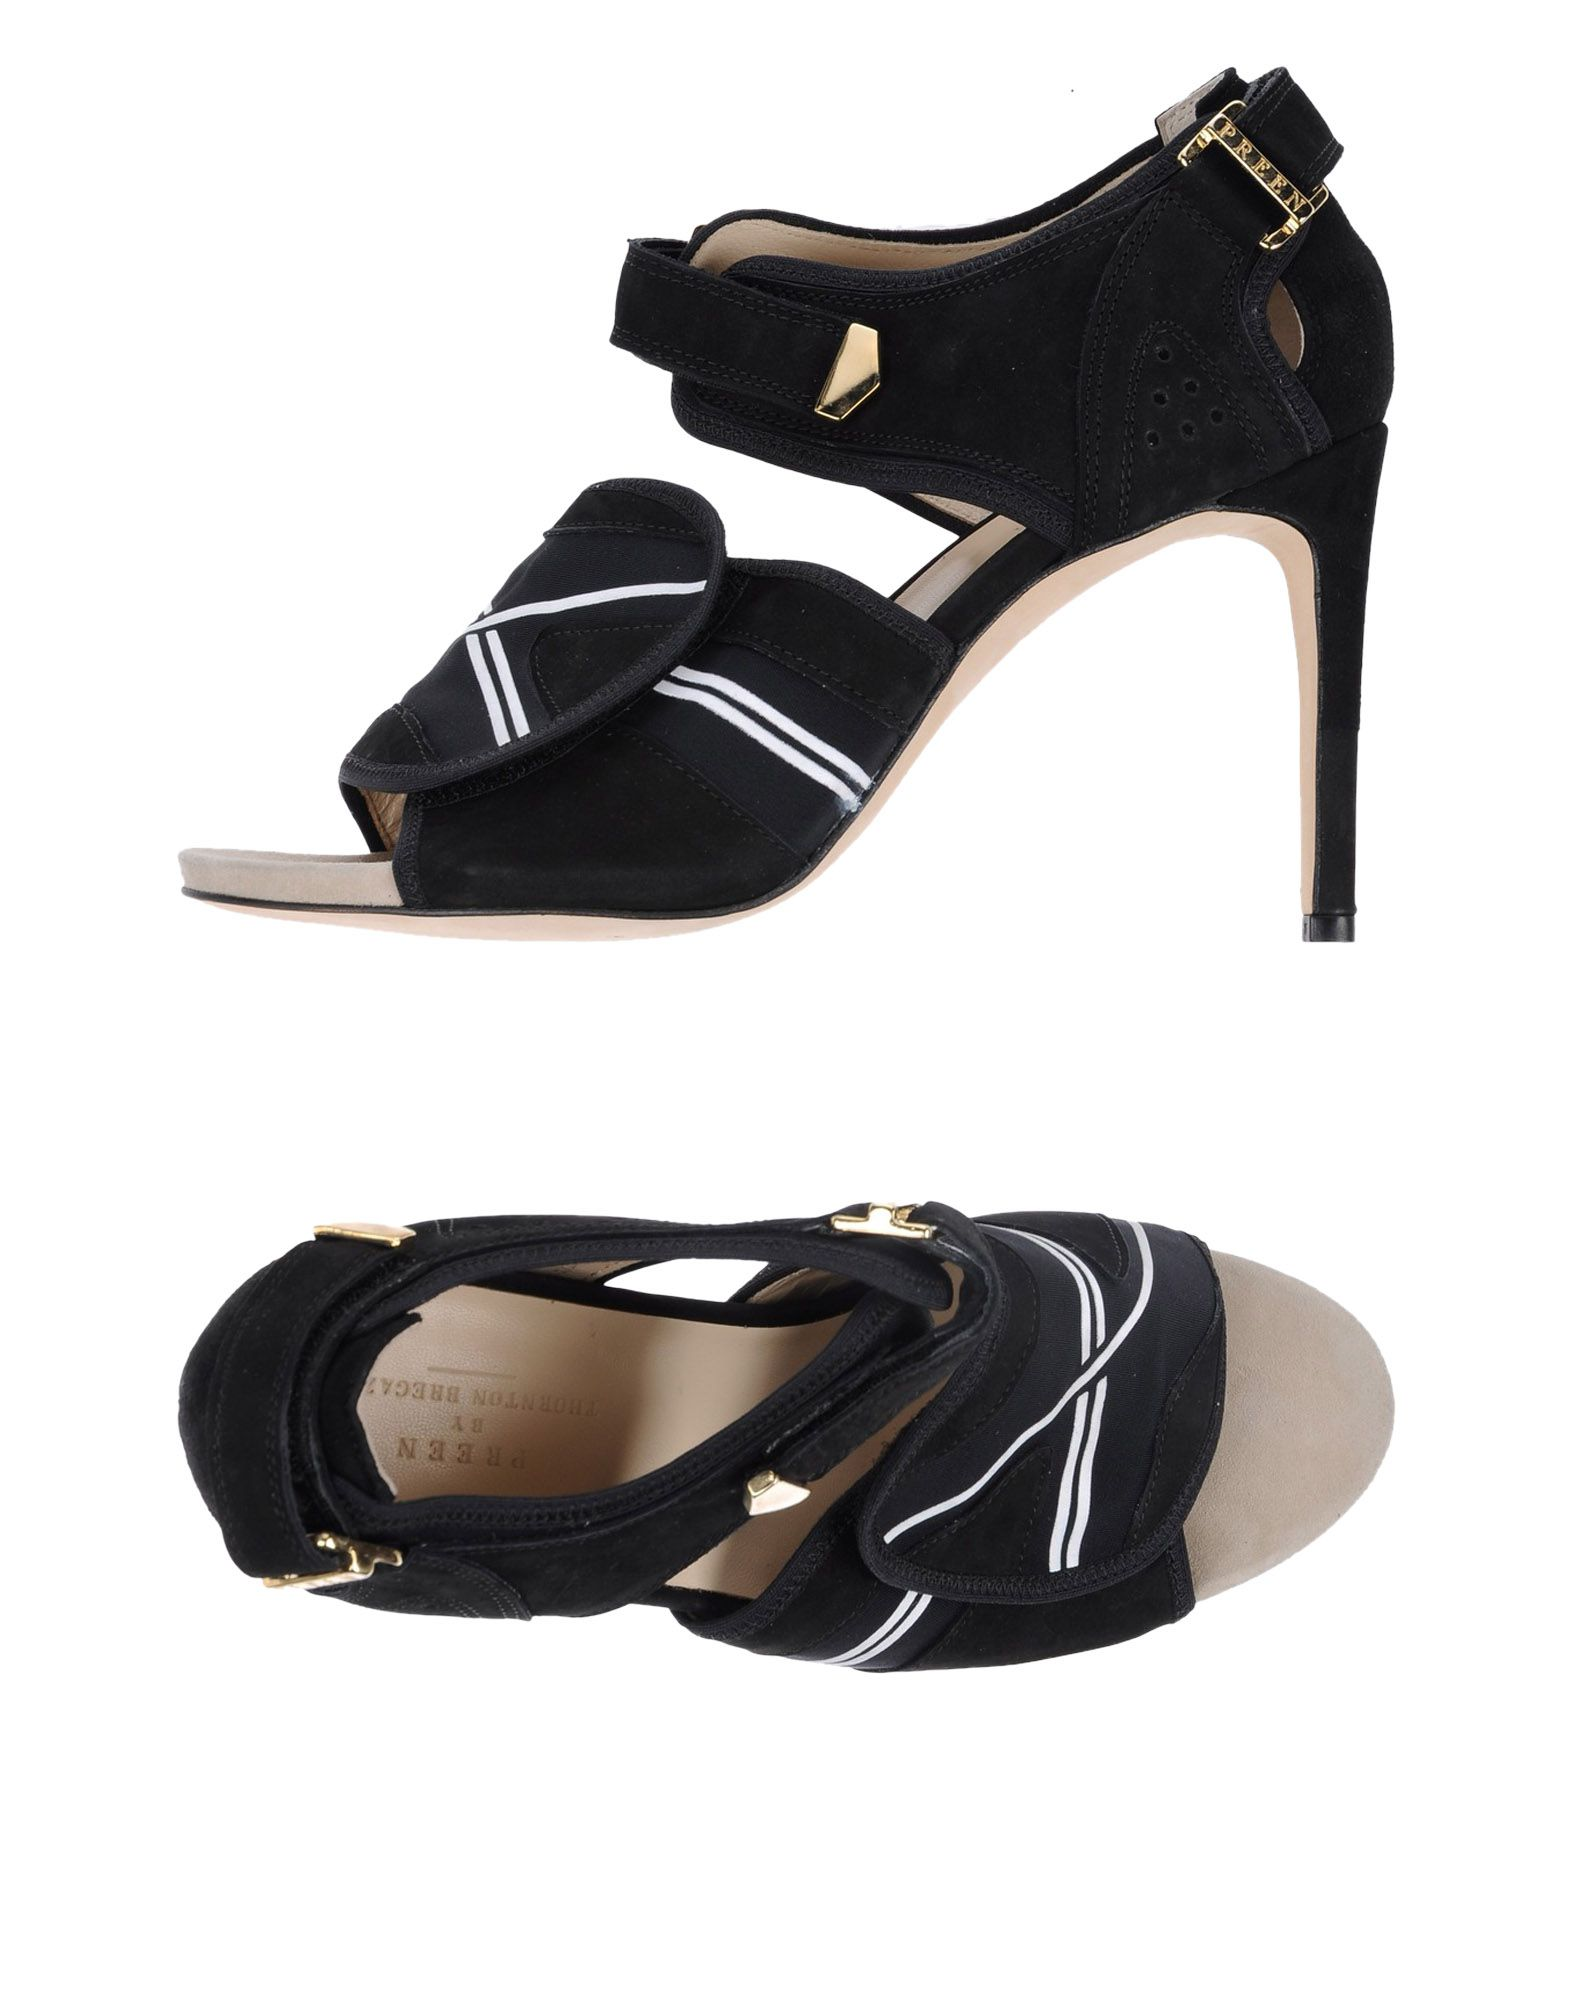 Sandales Preen By Thornton Bregazzi Femme - Sandales Preen By Thornton Bregazzi sur